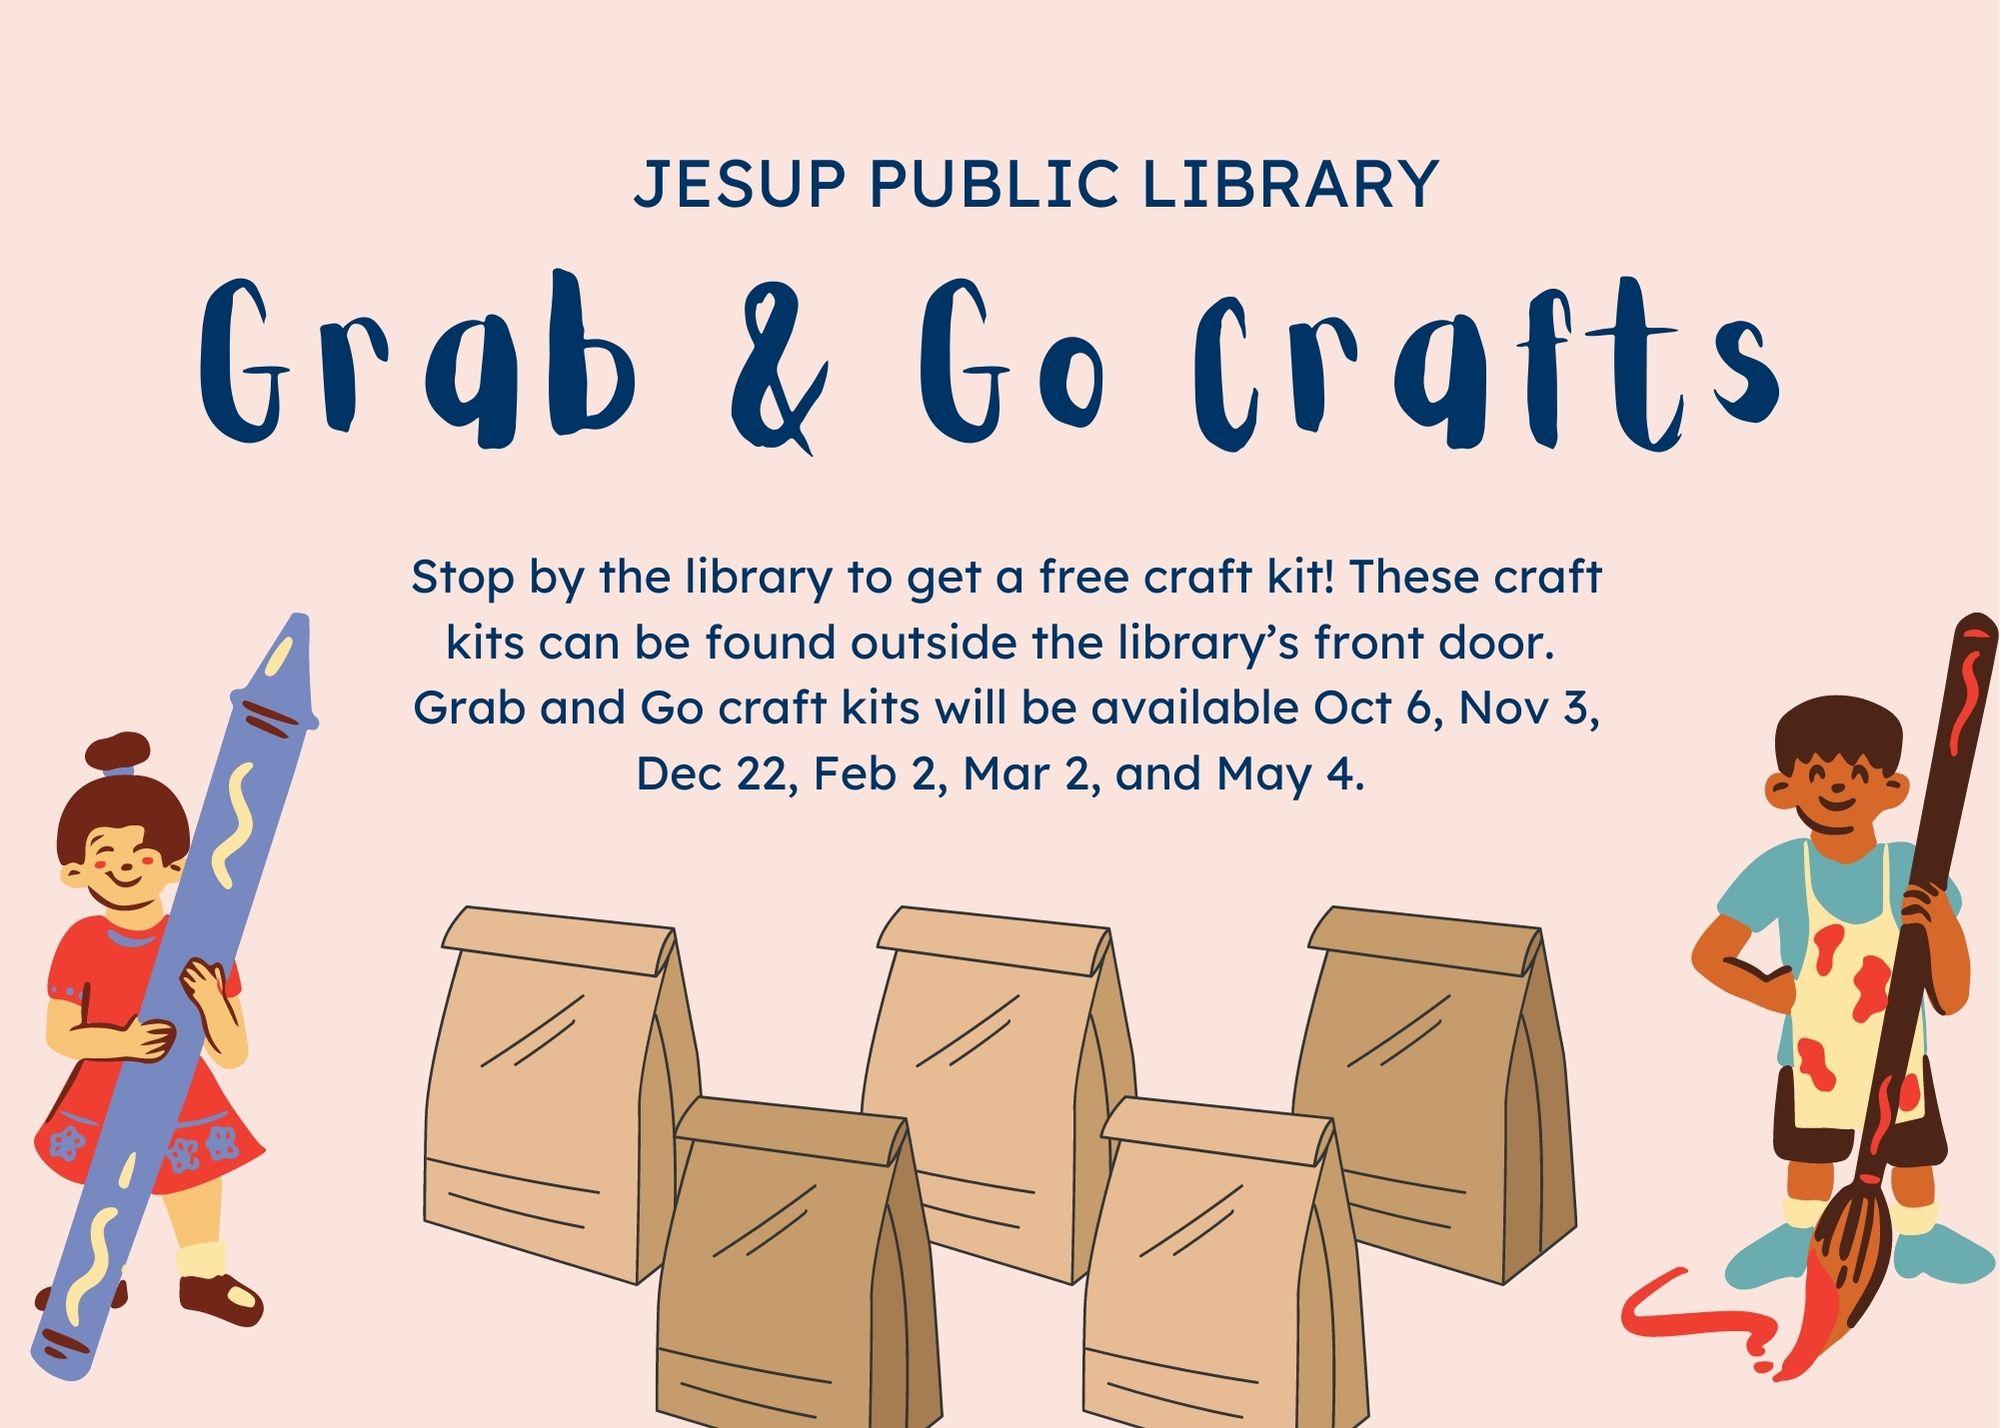 Grab & Go Crafts.jpg